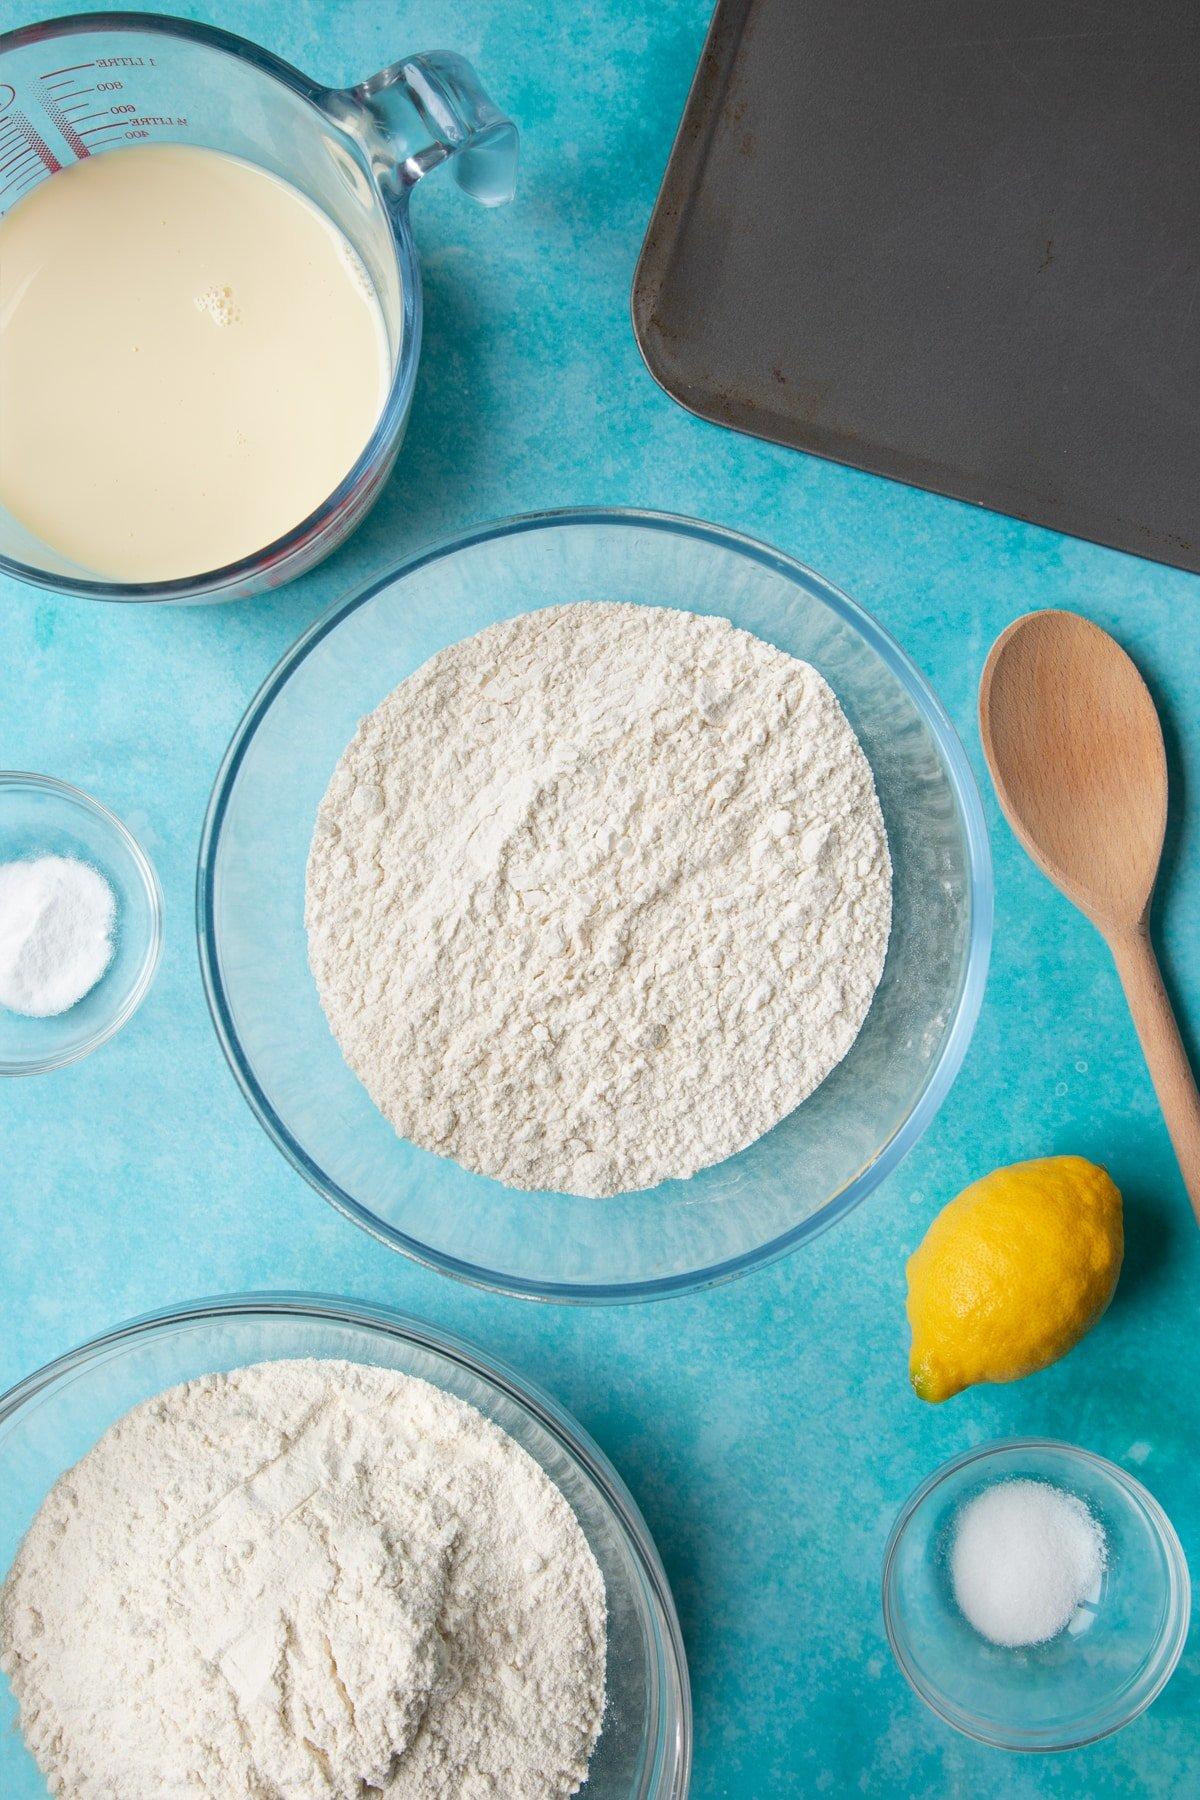 A bowl containing plain flour. Ingredients to make vegan soda bread surround the bowl.